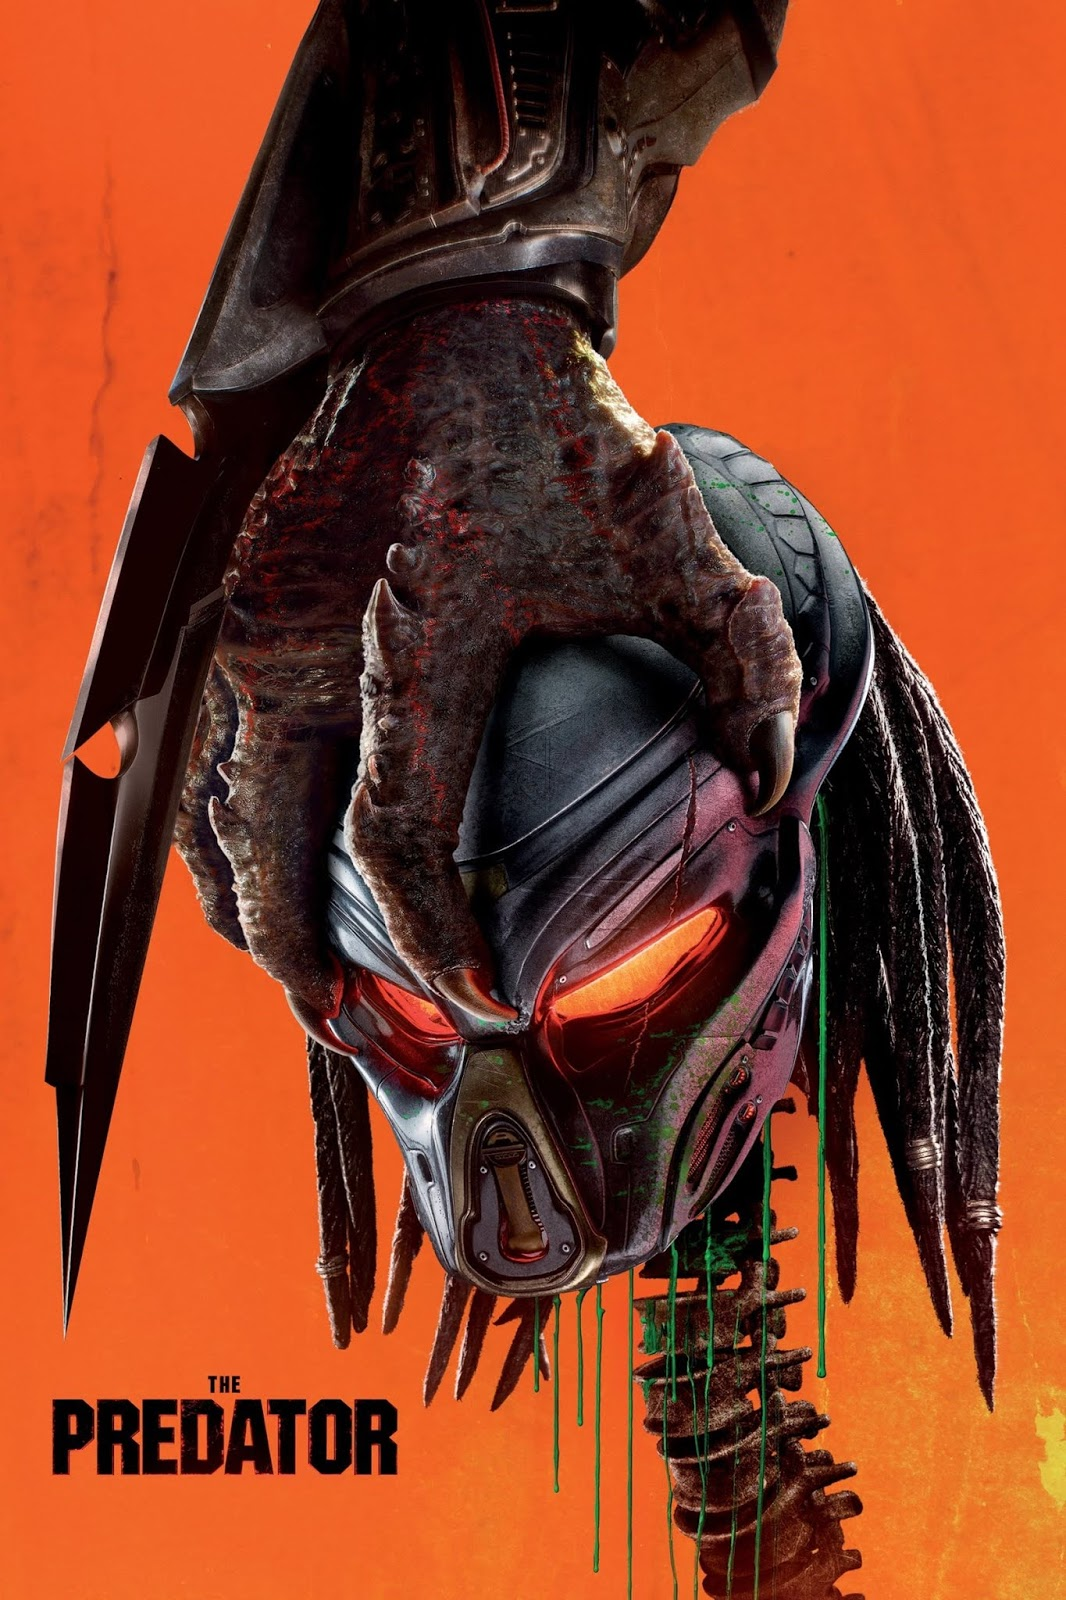 the predator 2018 full movie download in tamil in tamilrockers